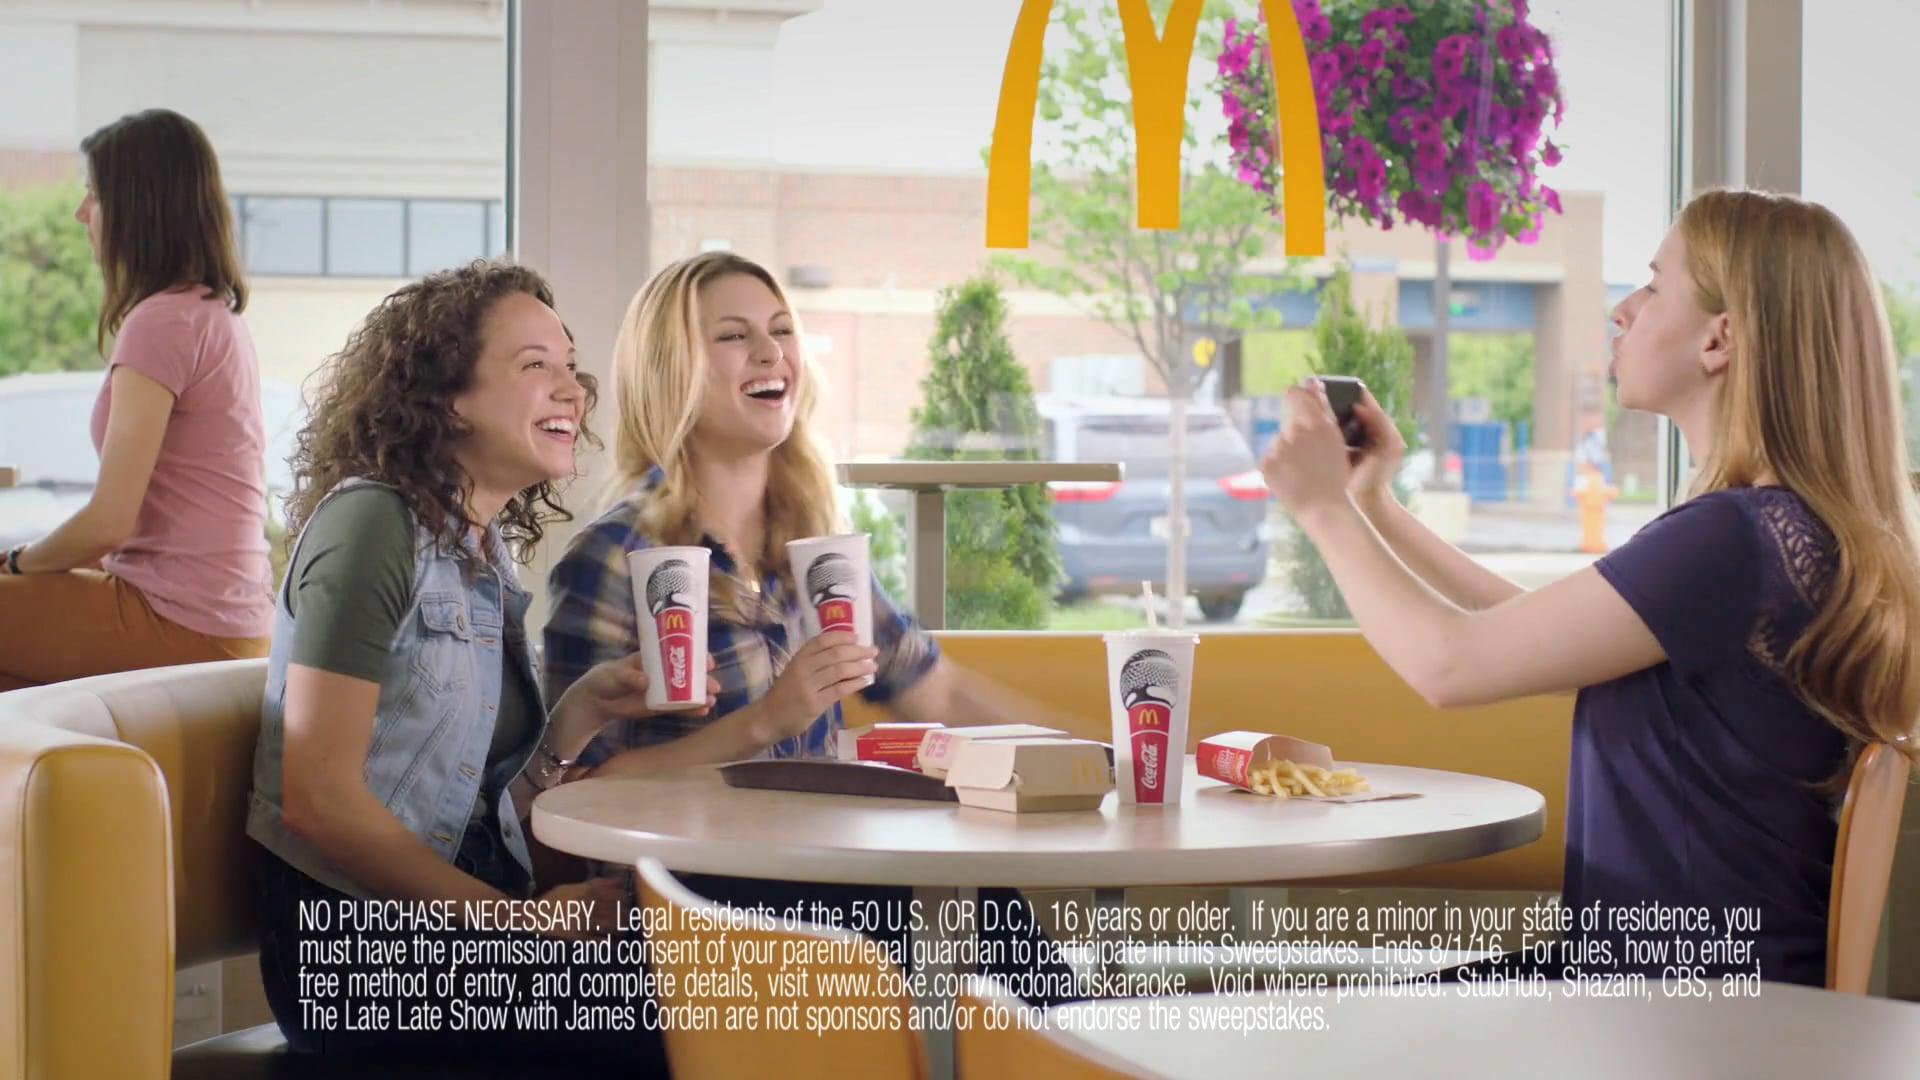 McDonalds/Coca-Cola Photo Booth